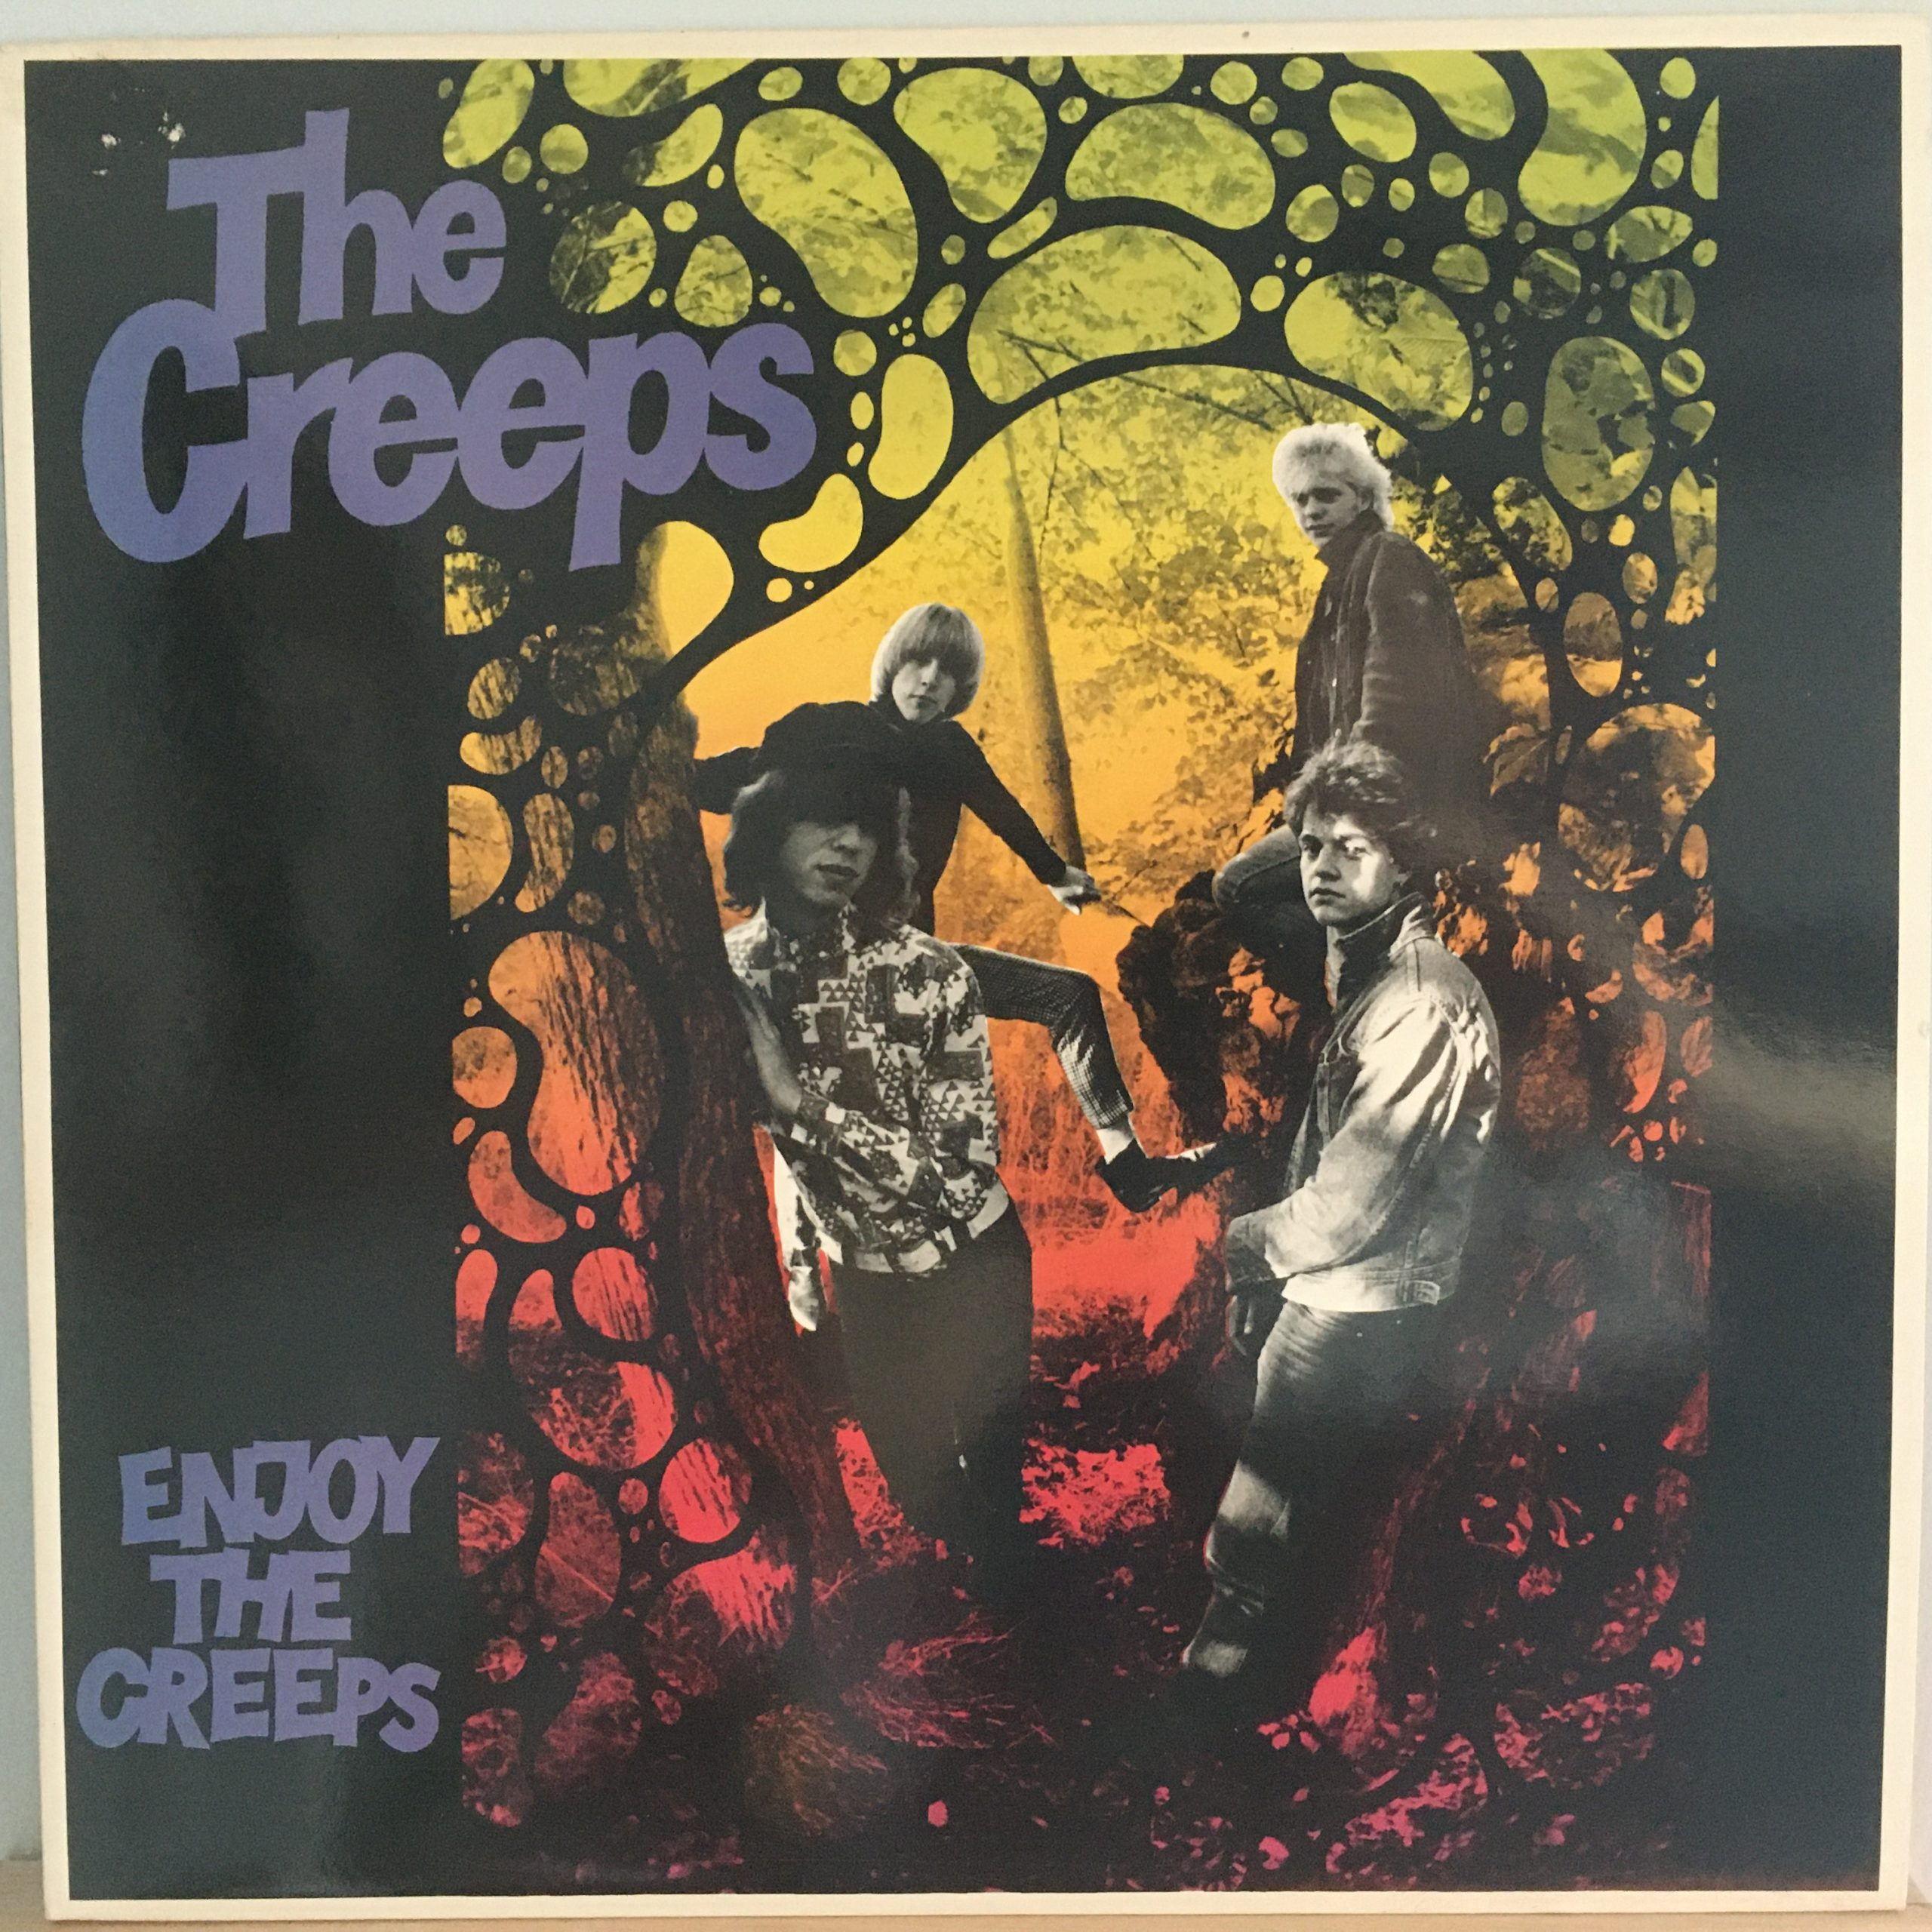 The Creeps -- Enjoy The Creeps